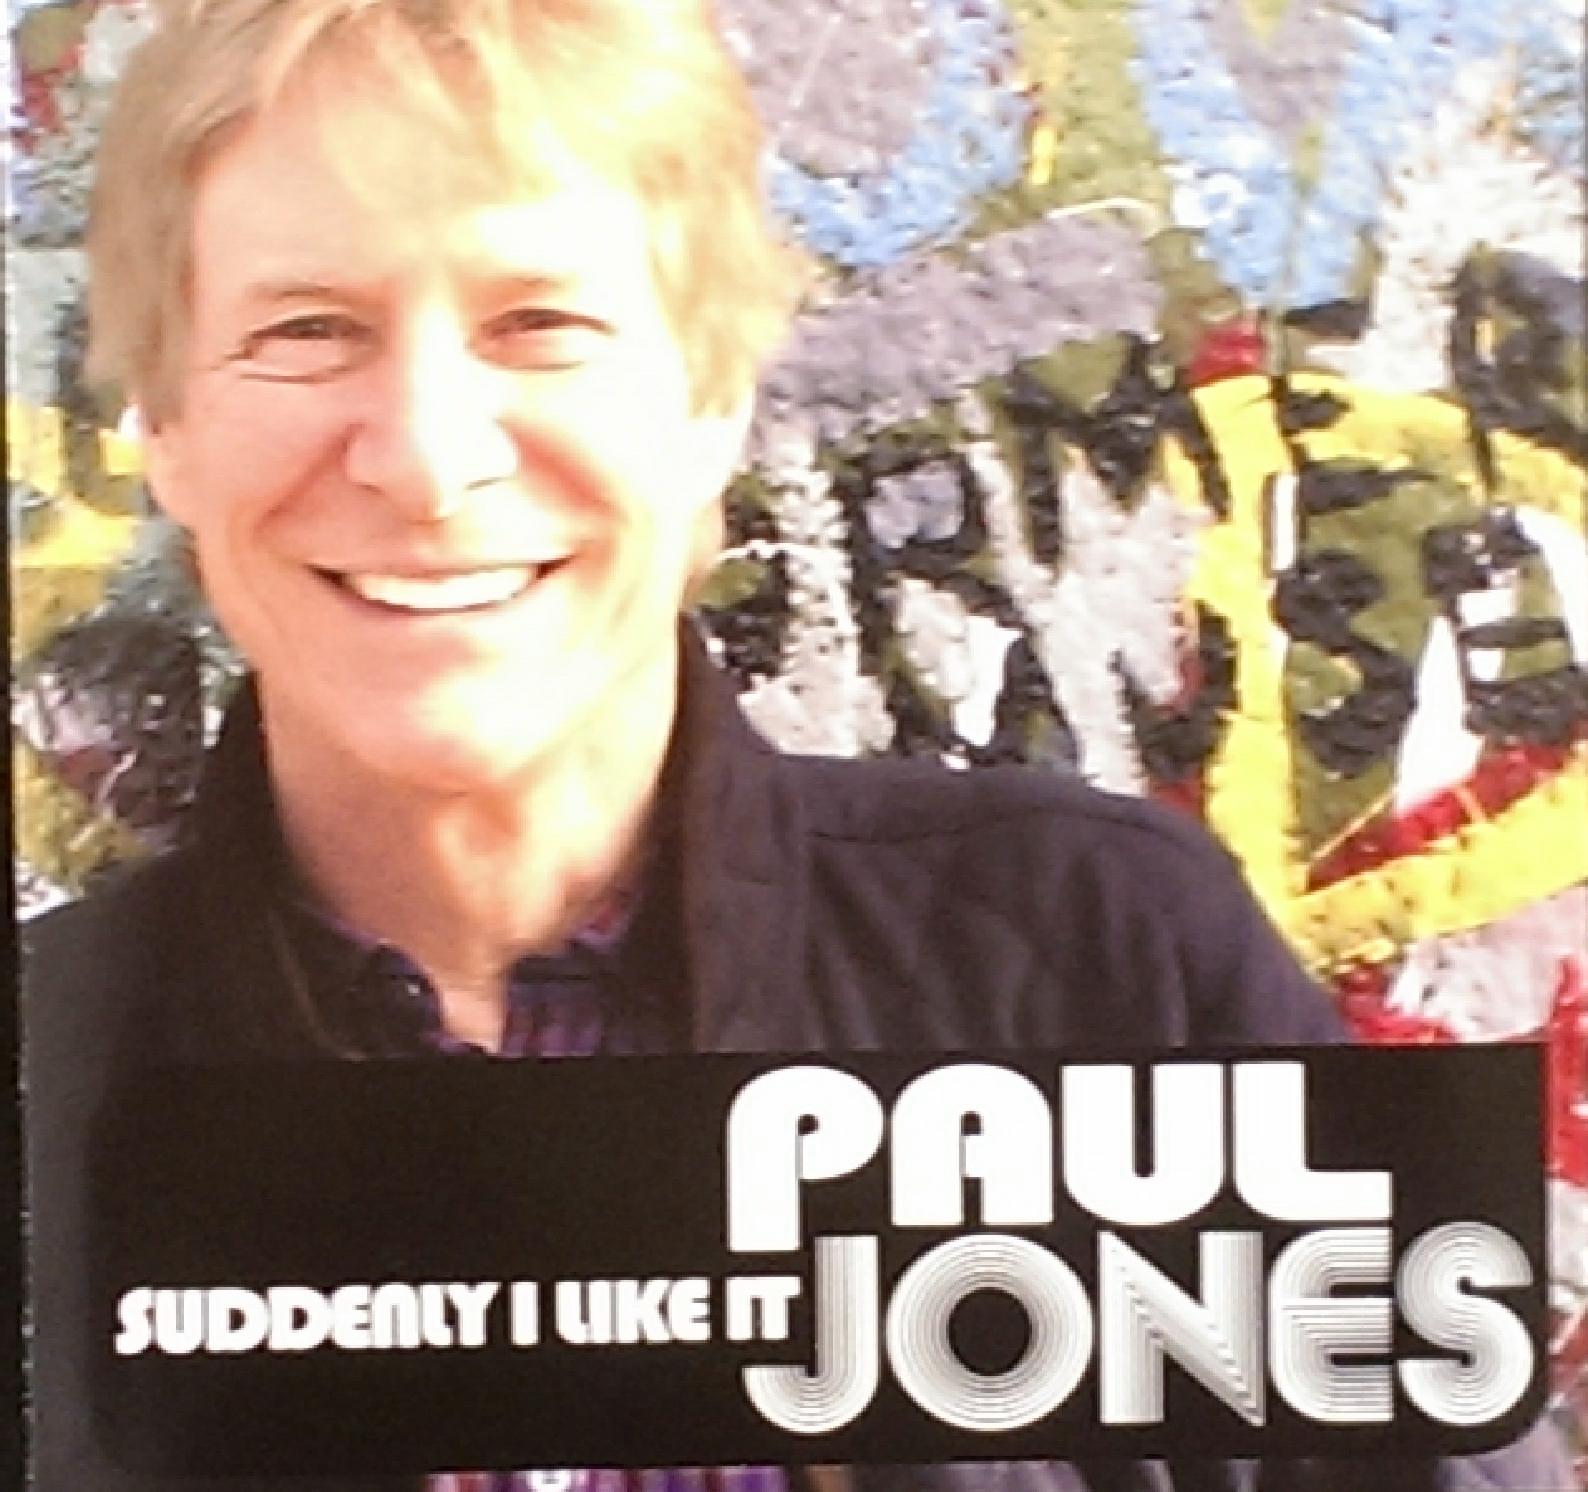 *NEW* Paul Jones \'Suddenly I Like It\' SIGNED COPY